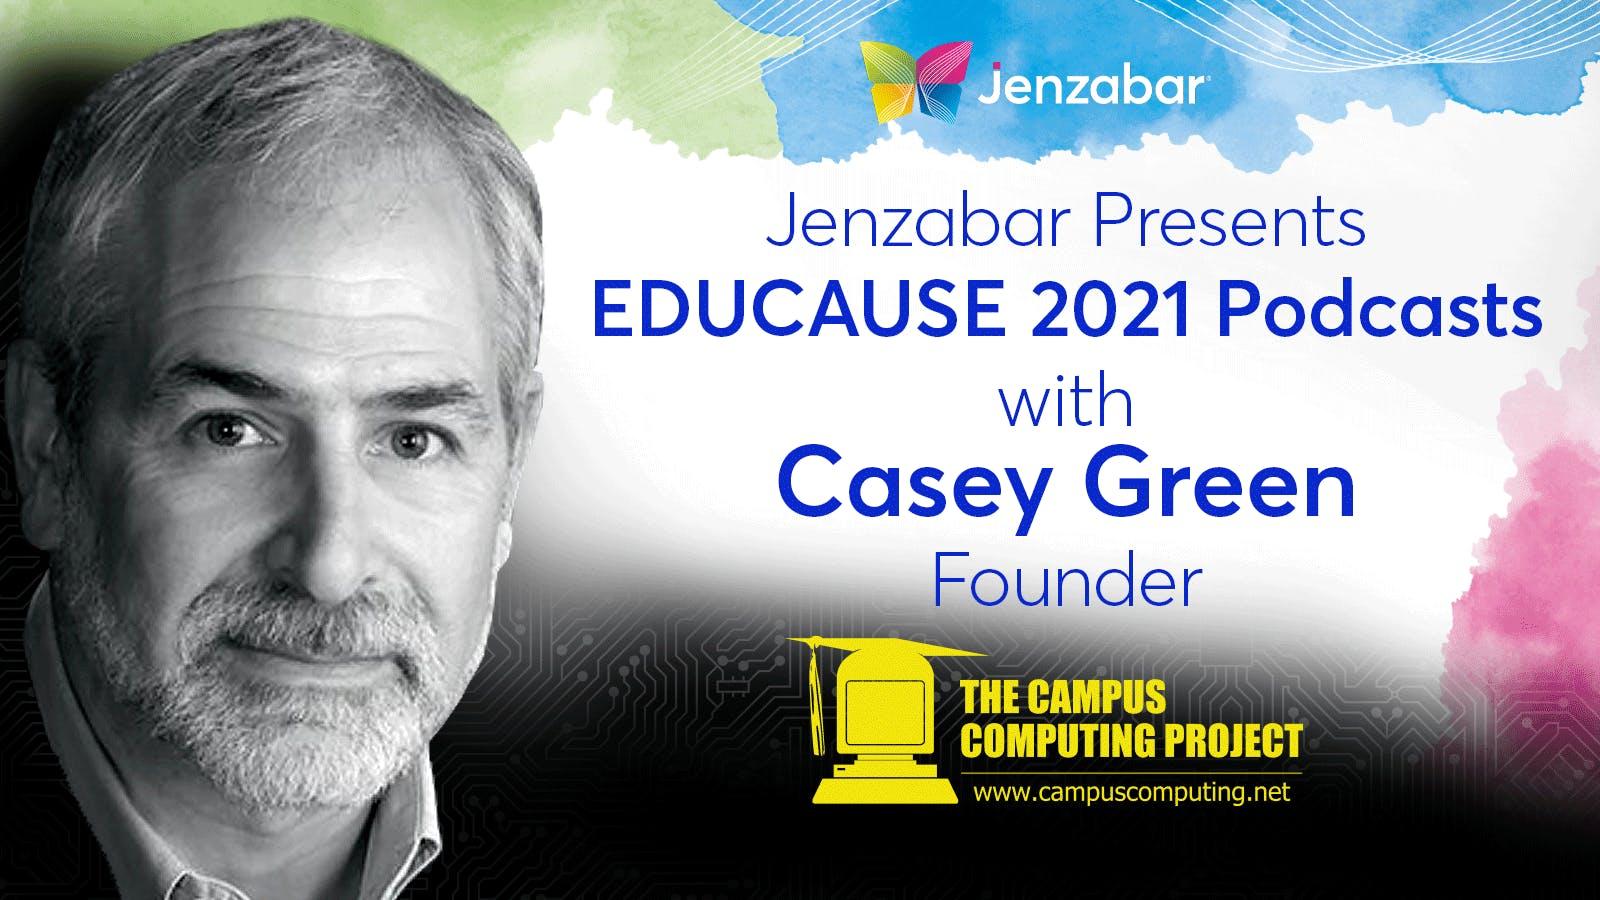 EDUCAUSE 2021 Podcast